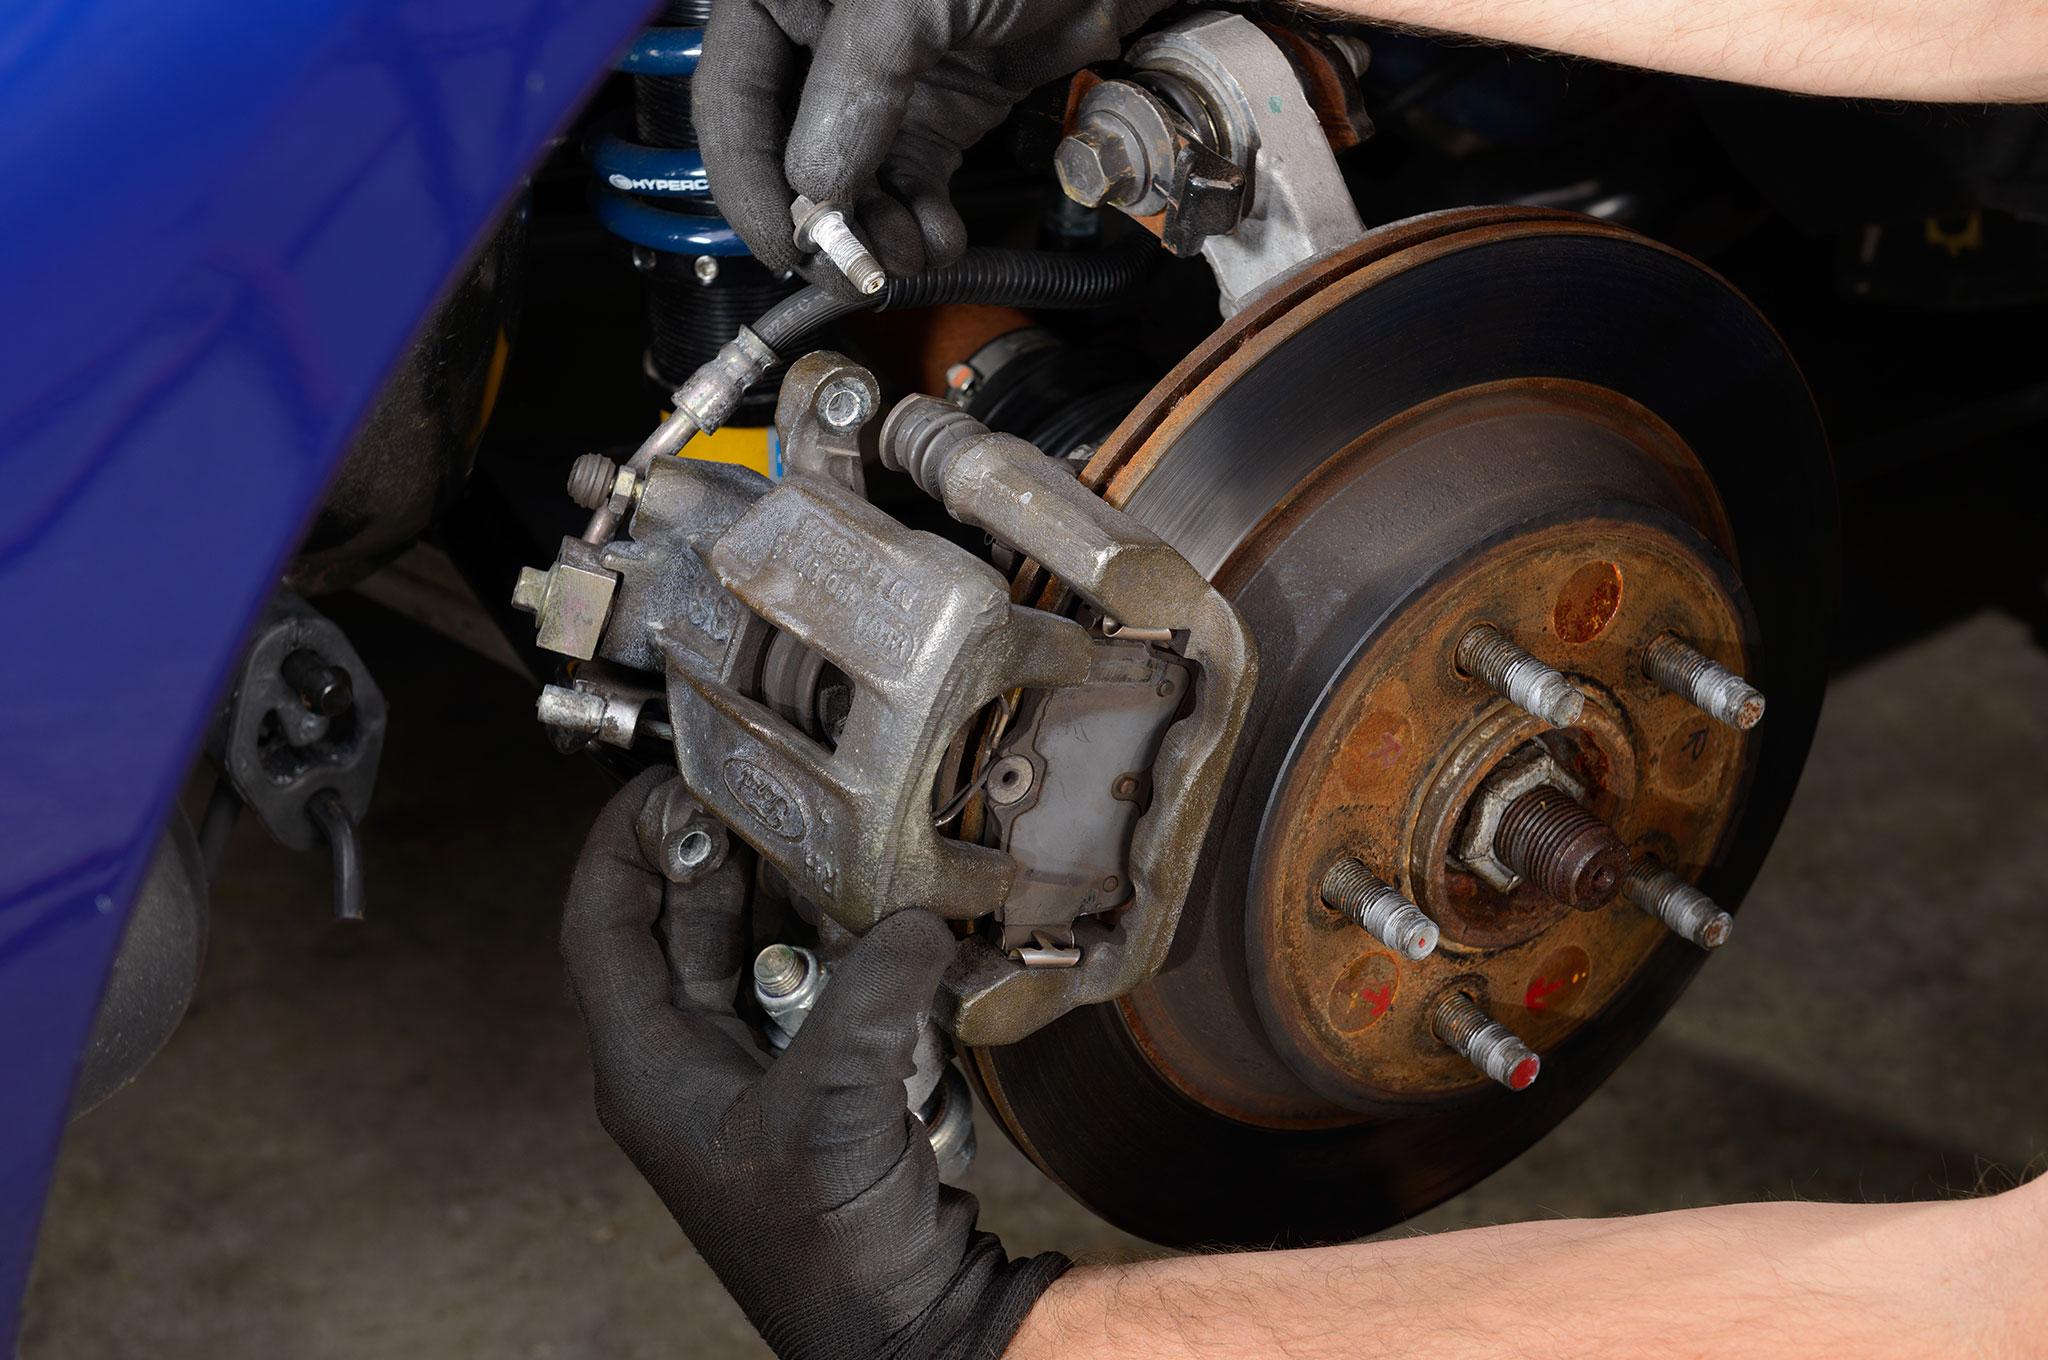 02 2003 Ford Mustang Cobra Removing Brake Caliper